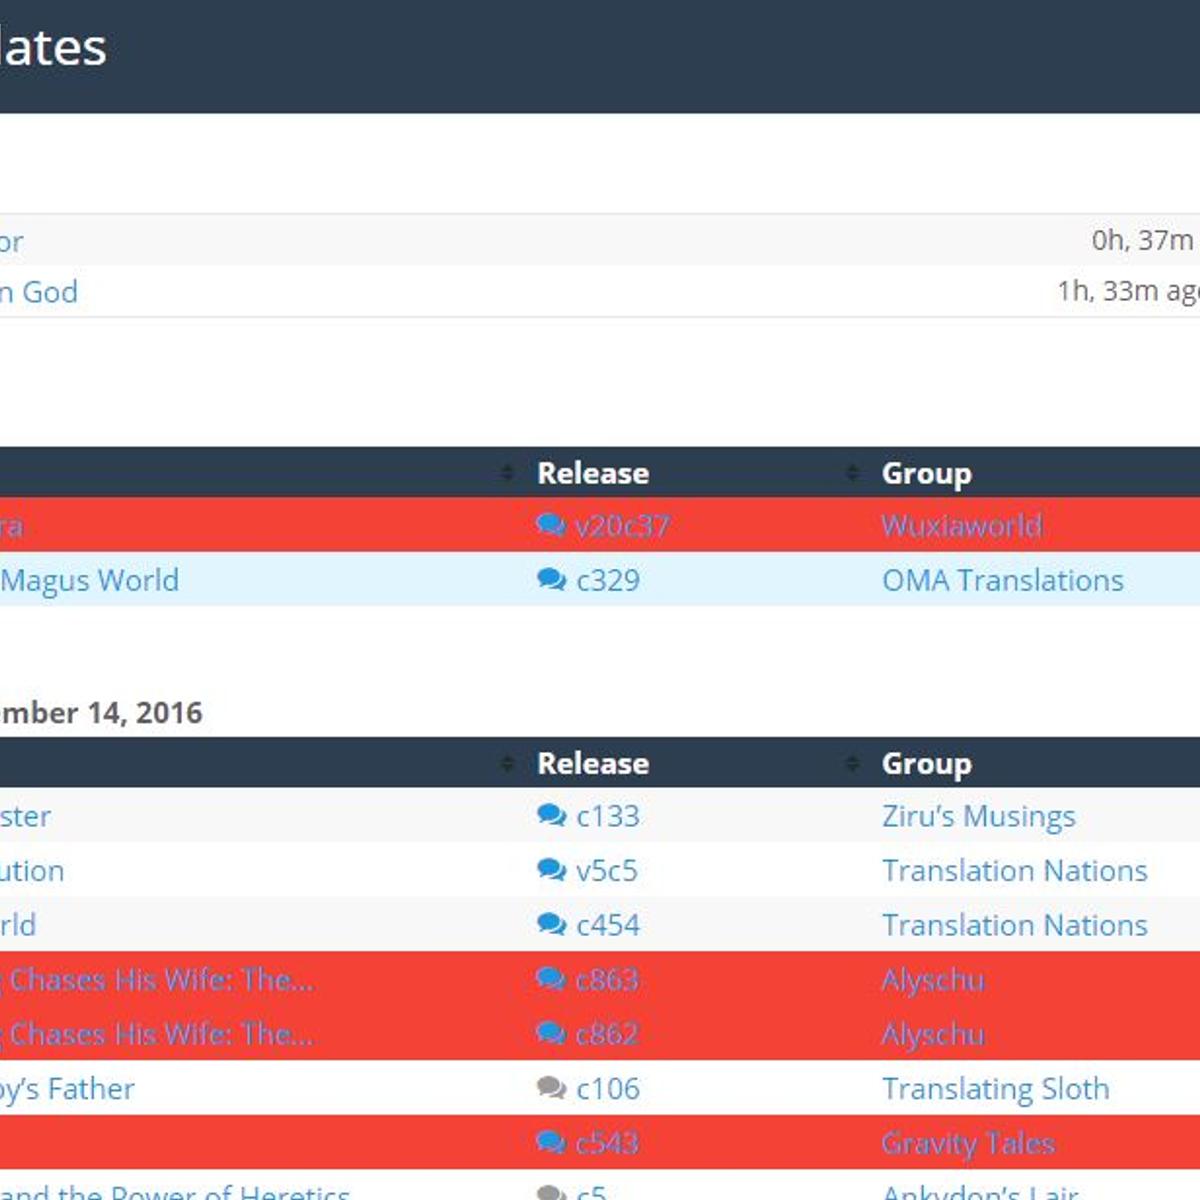 NovelUpdates Alternatives and Similar Websites and Apps